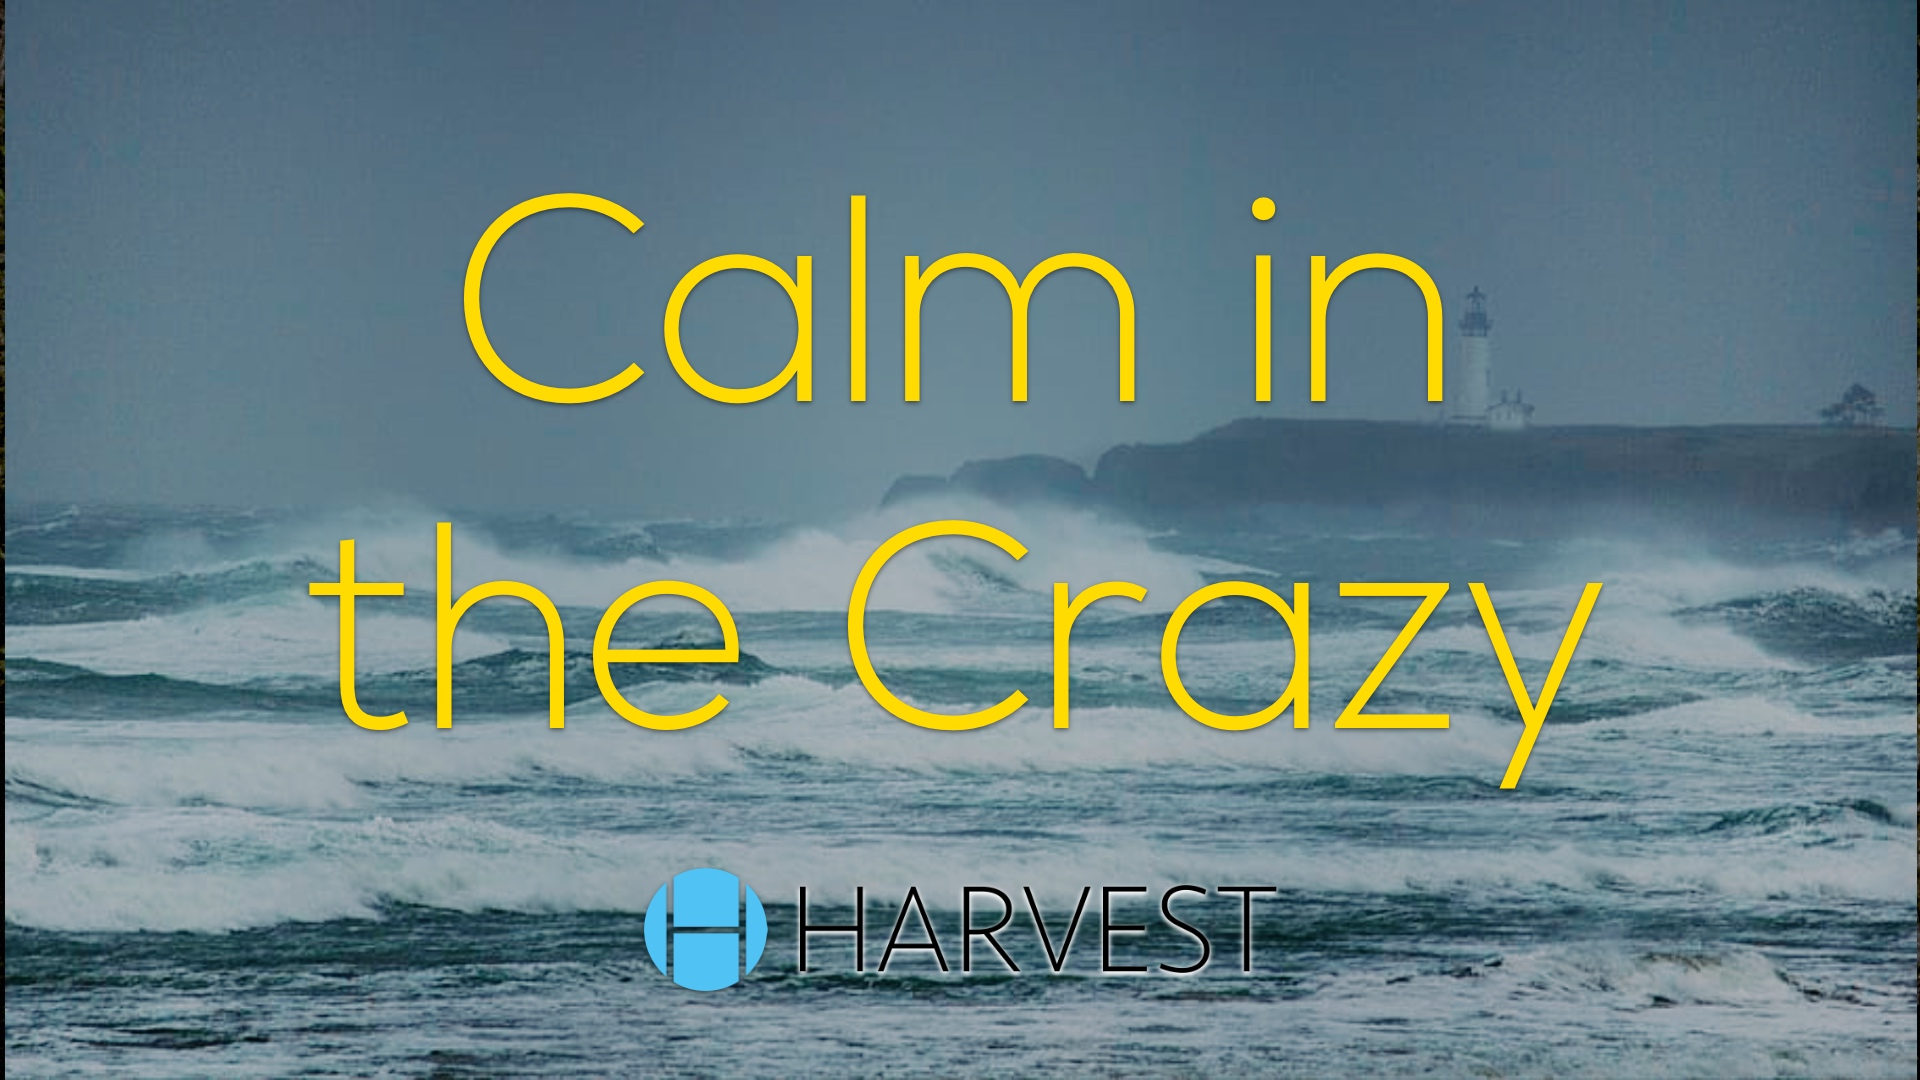 Calm in the Crazy